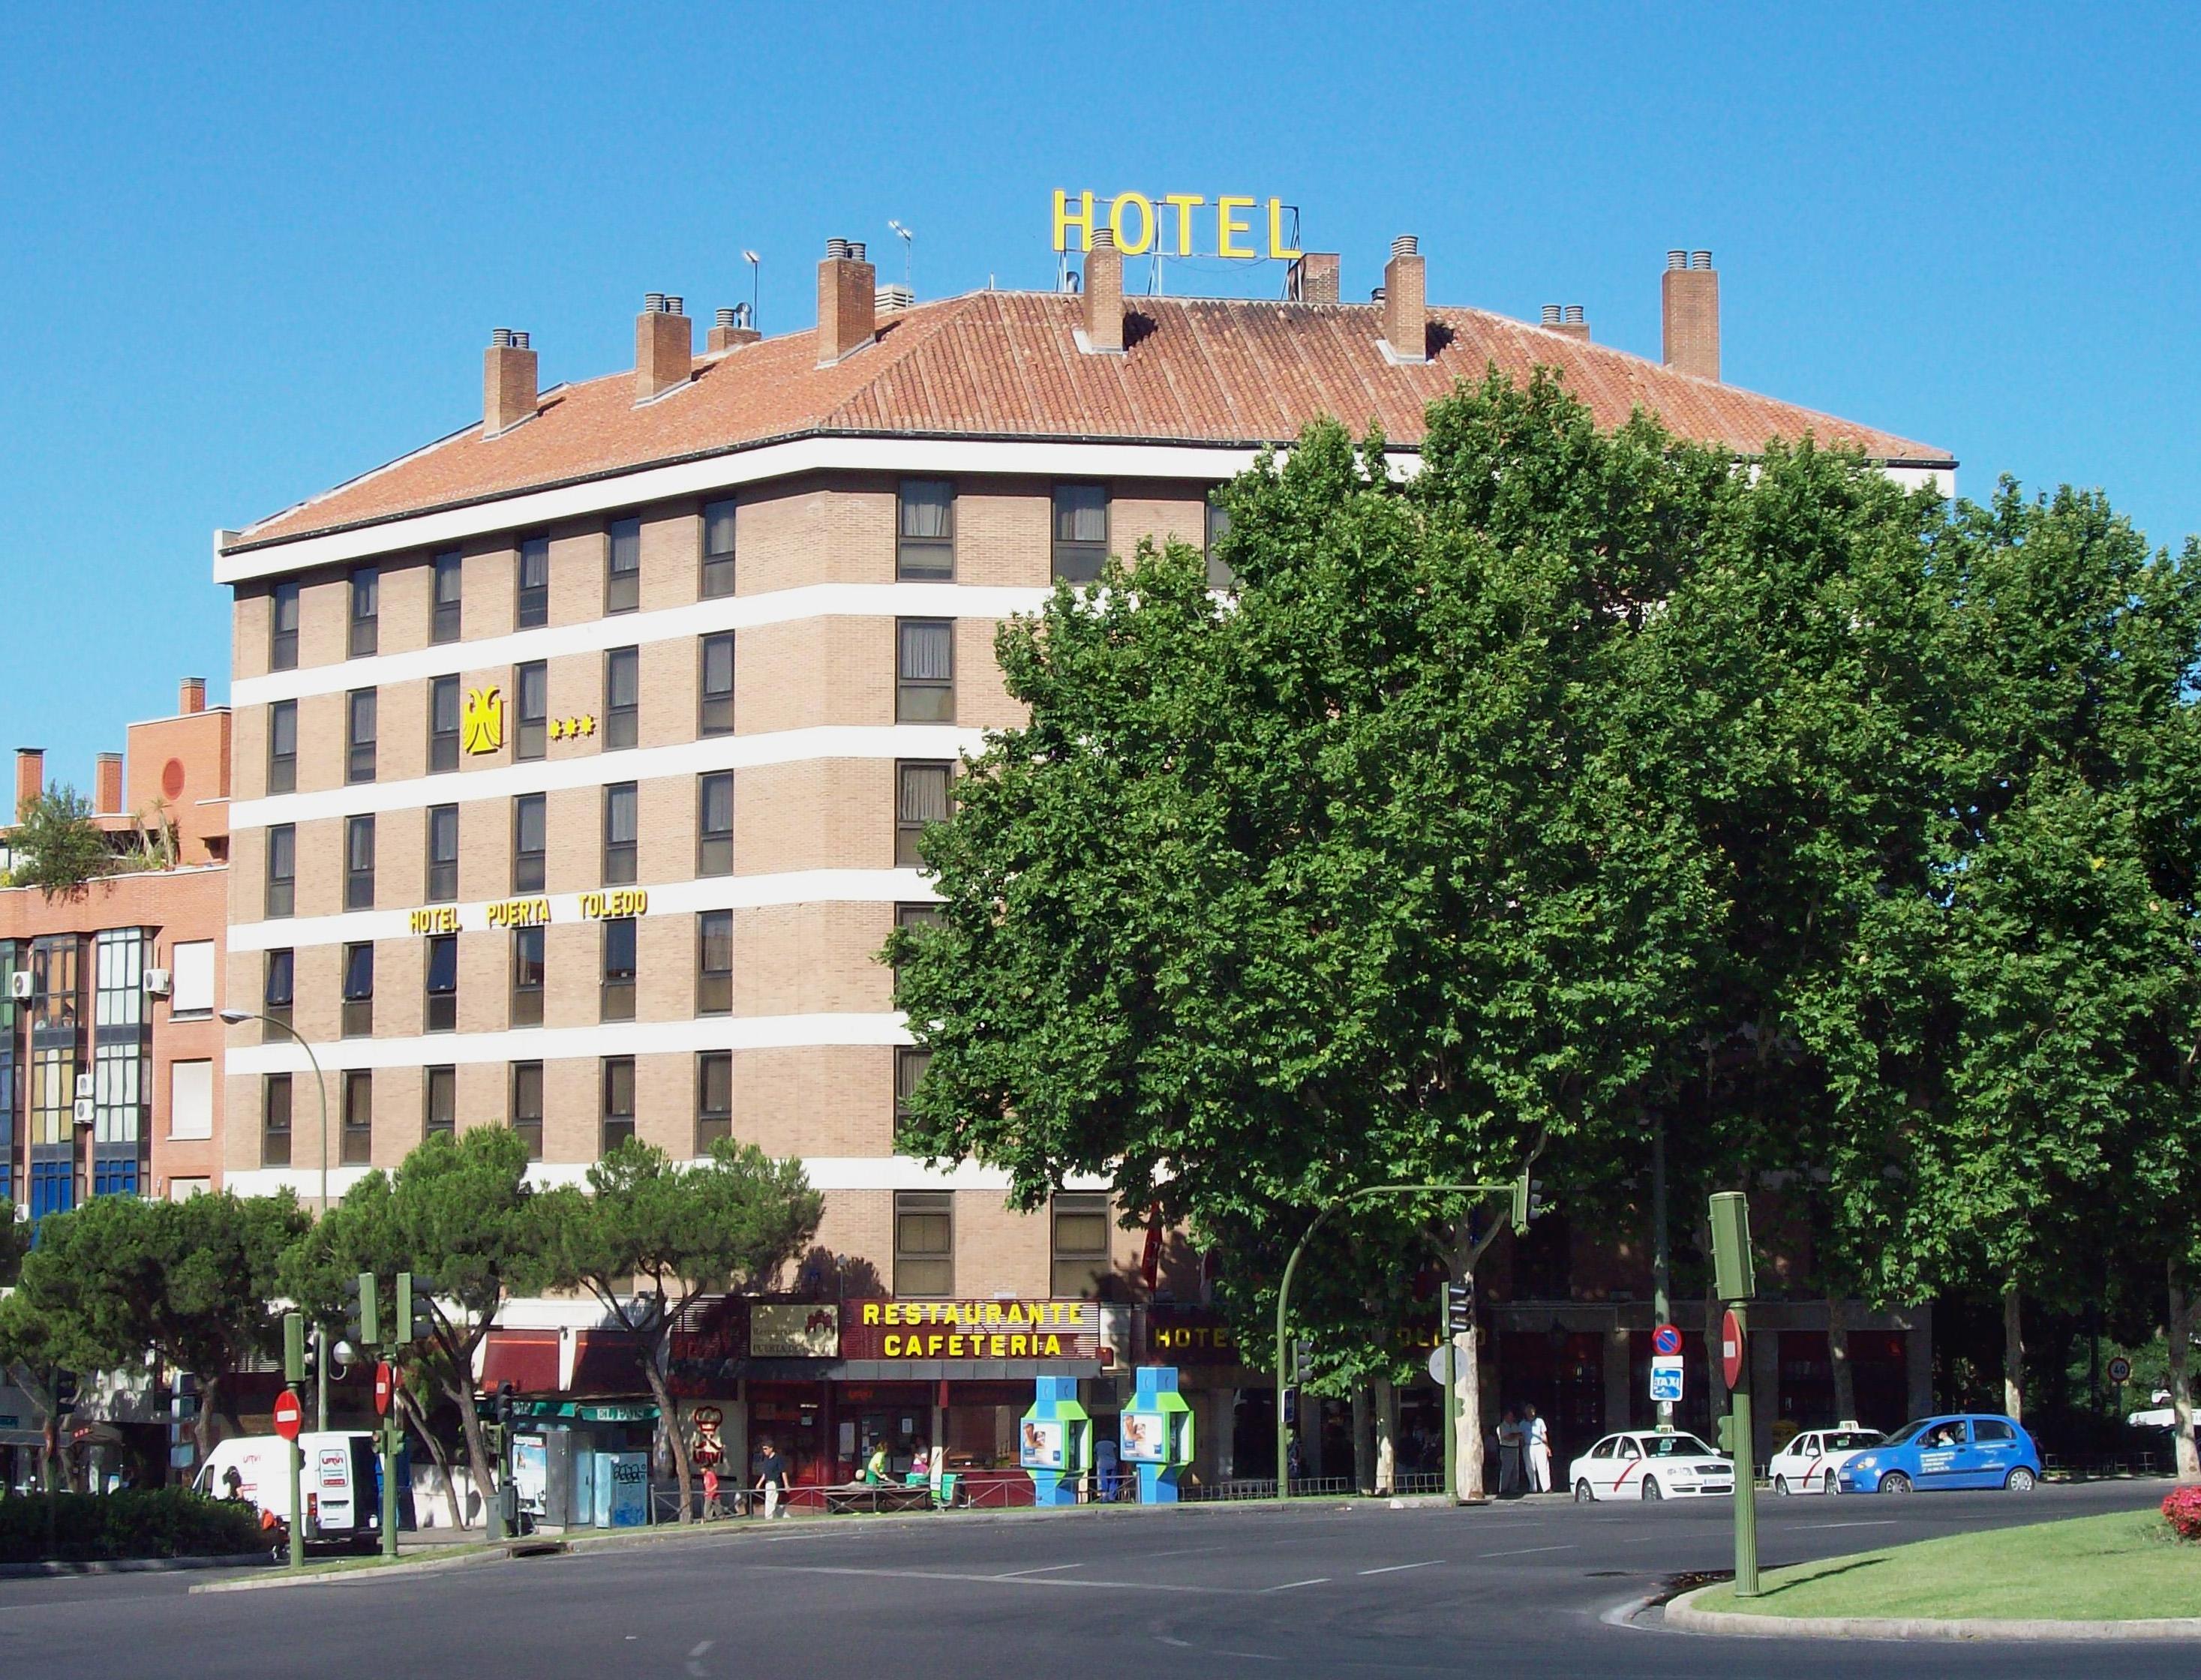 Visita a madrid per a joves junio 2014 - Hotel catalonia madrid puerta del sol ...